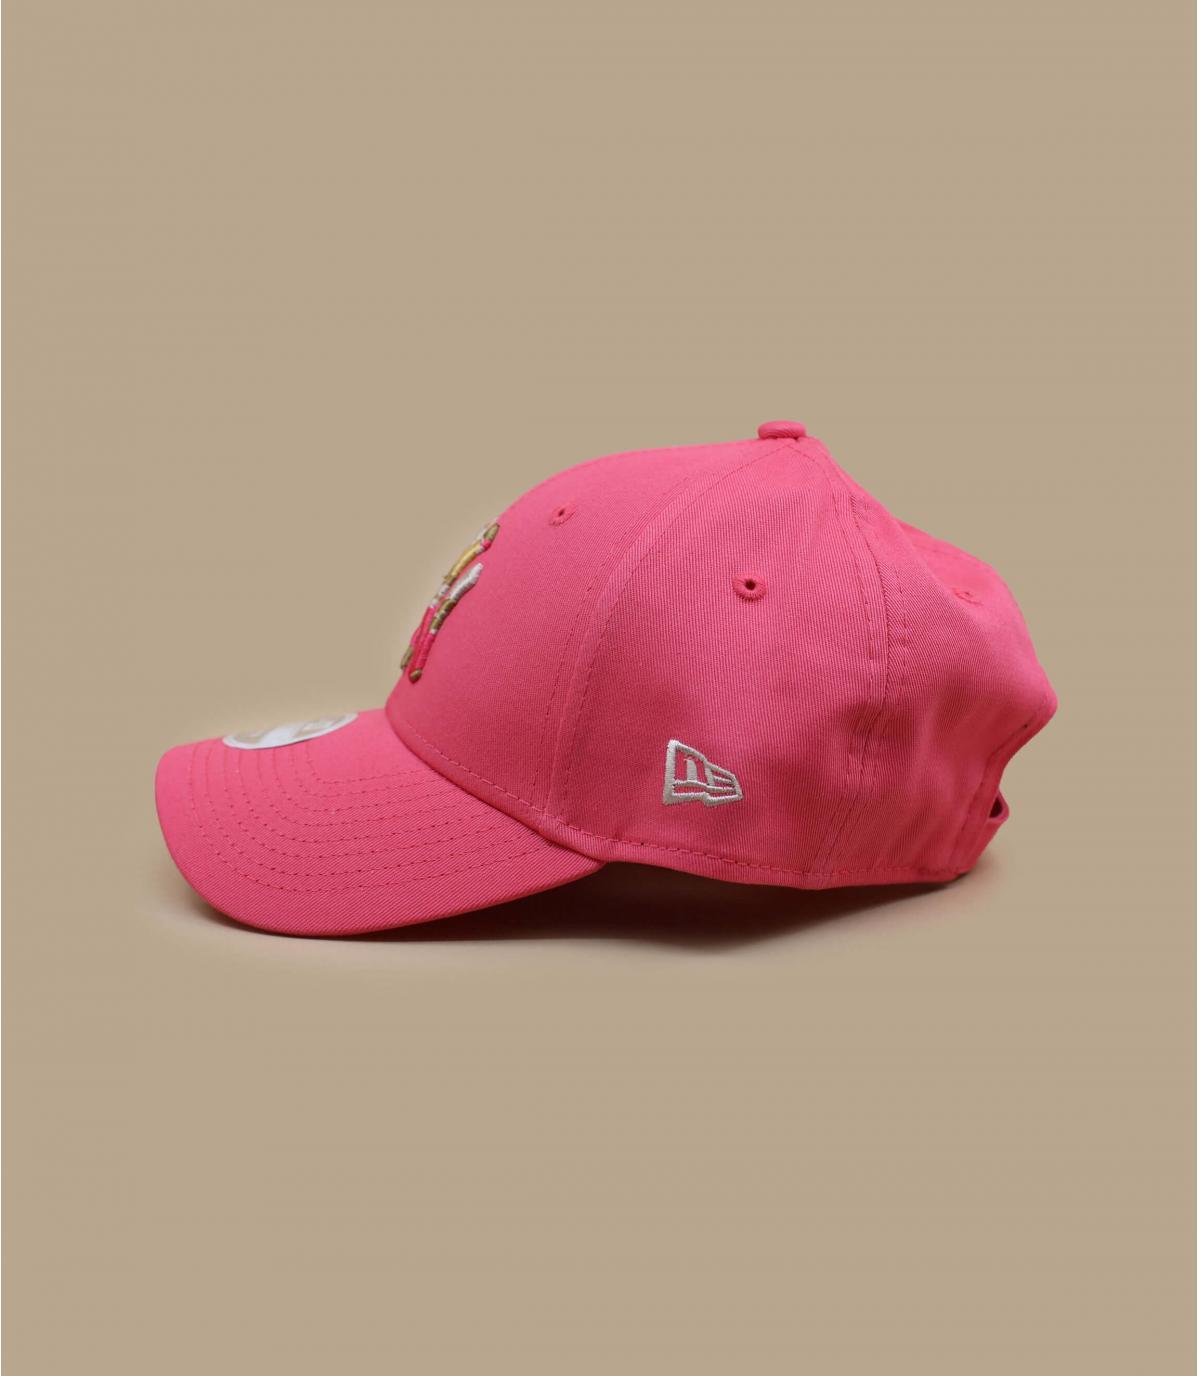 Details Wmn Camo Infill NY 940 pink - Abbildung 3